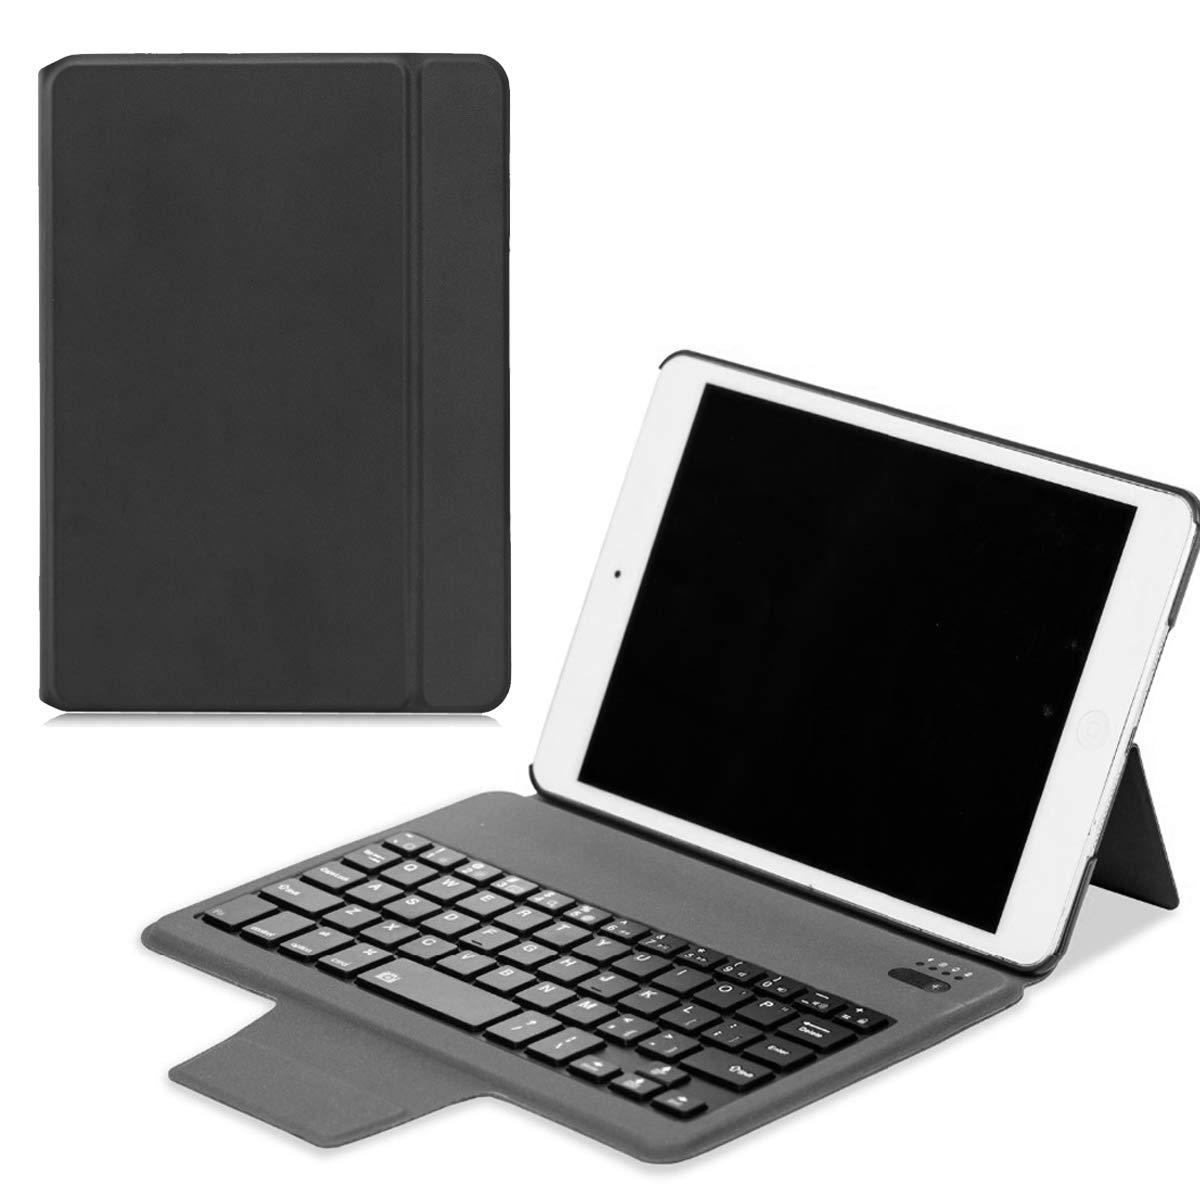 iPad Mini 4キーボードケース ワイヤレスレザーキーボードケース 超薄型ポータブル軽量タブレットプロテクターキーボード iPad Mini 4用   B07LF6V9X6